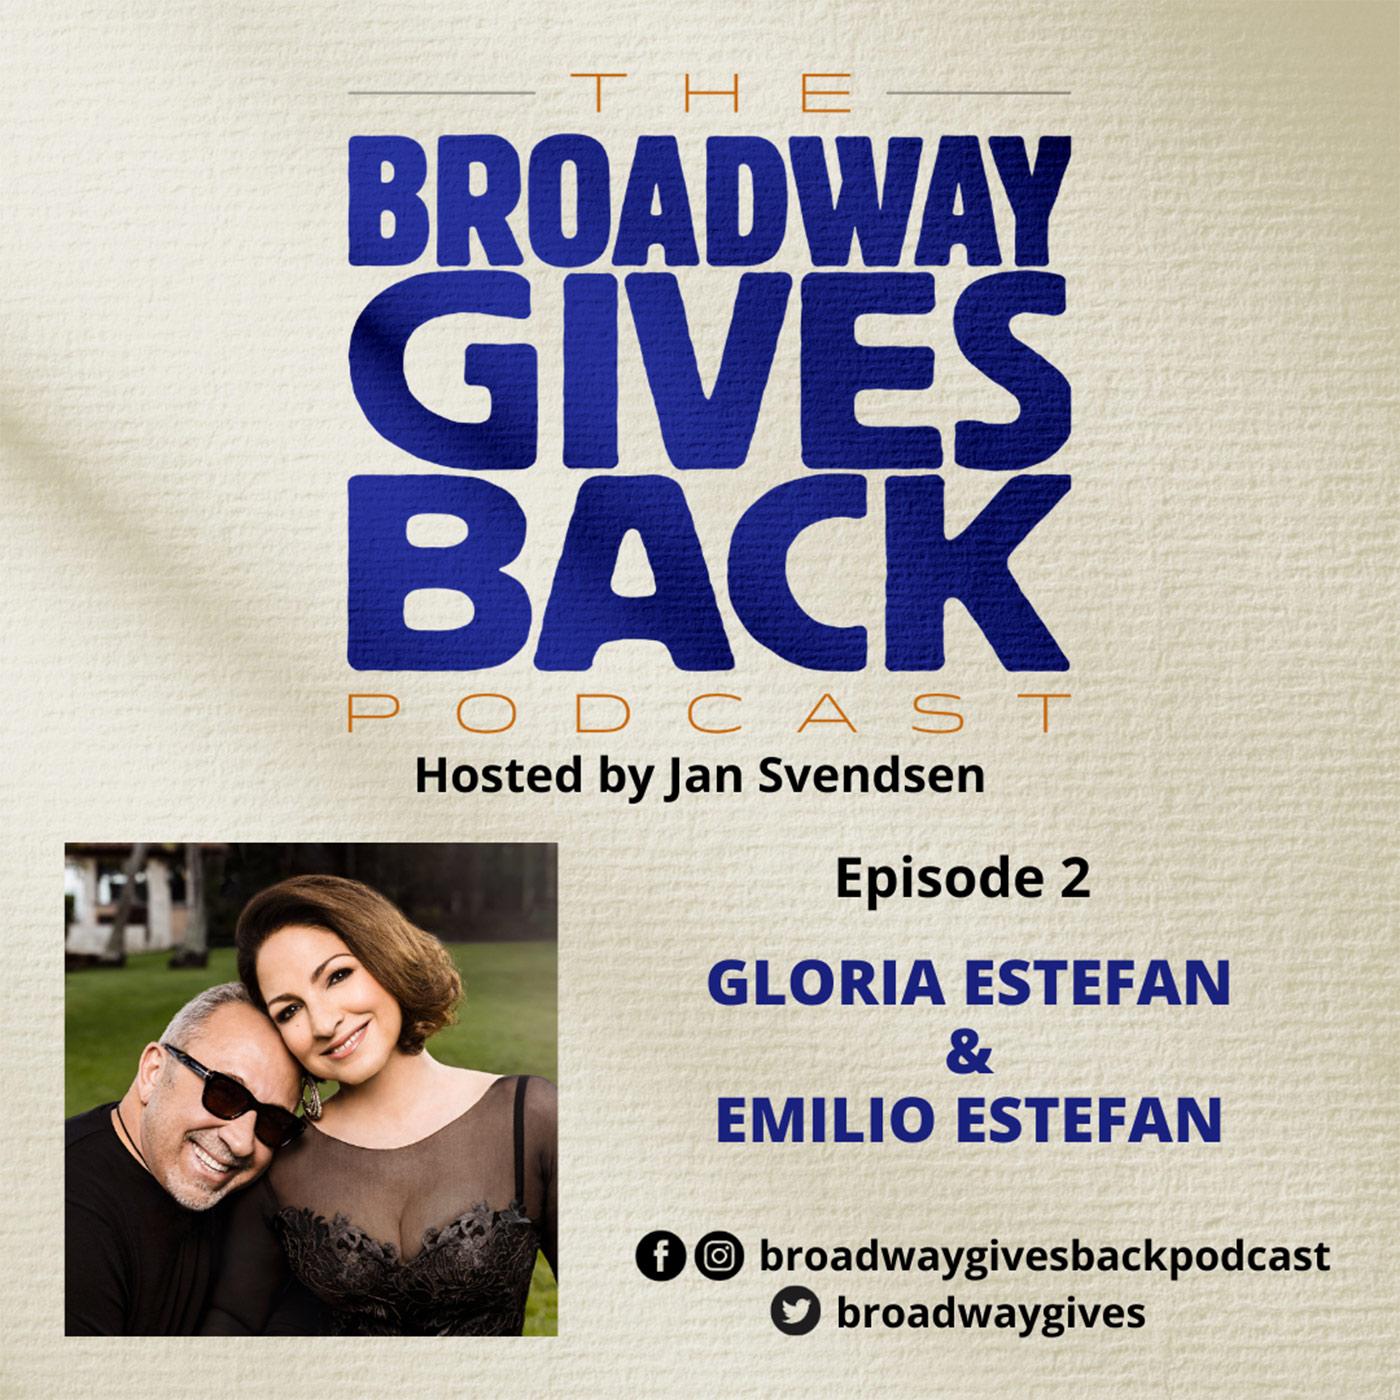 Broadway Gives Back - Ep2 Gloria Estefan